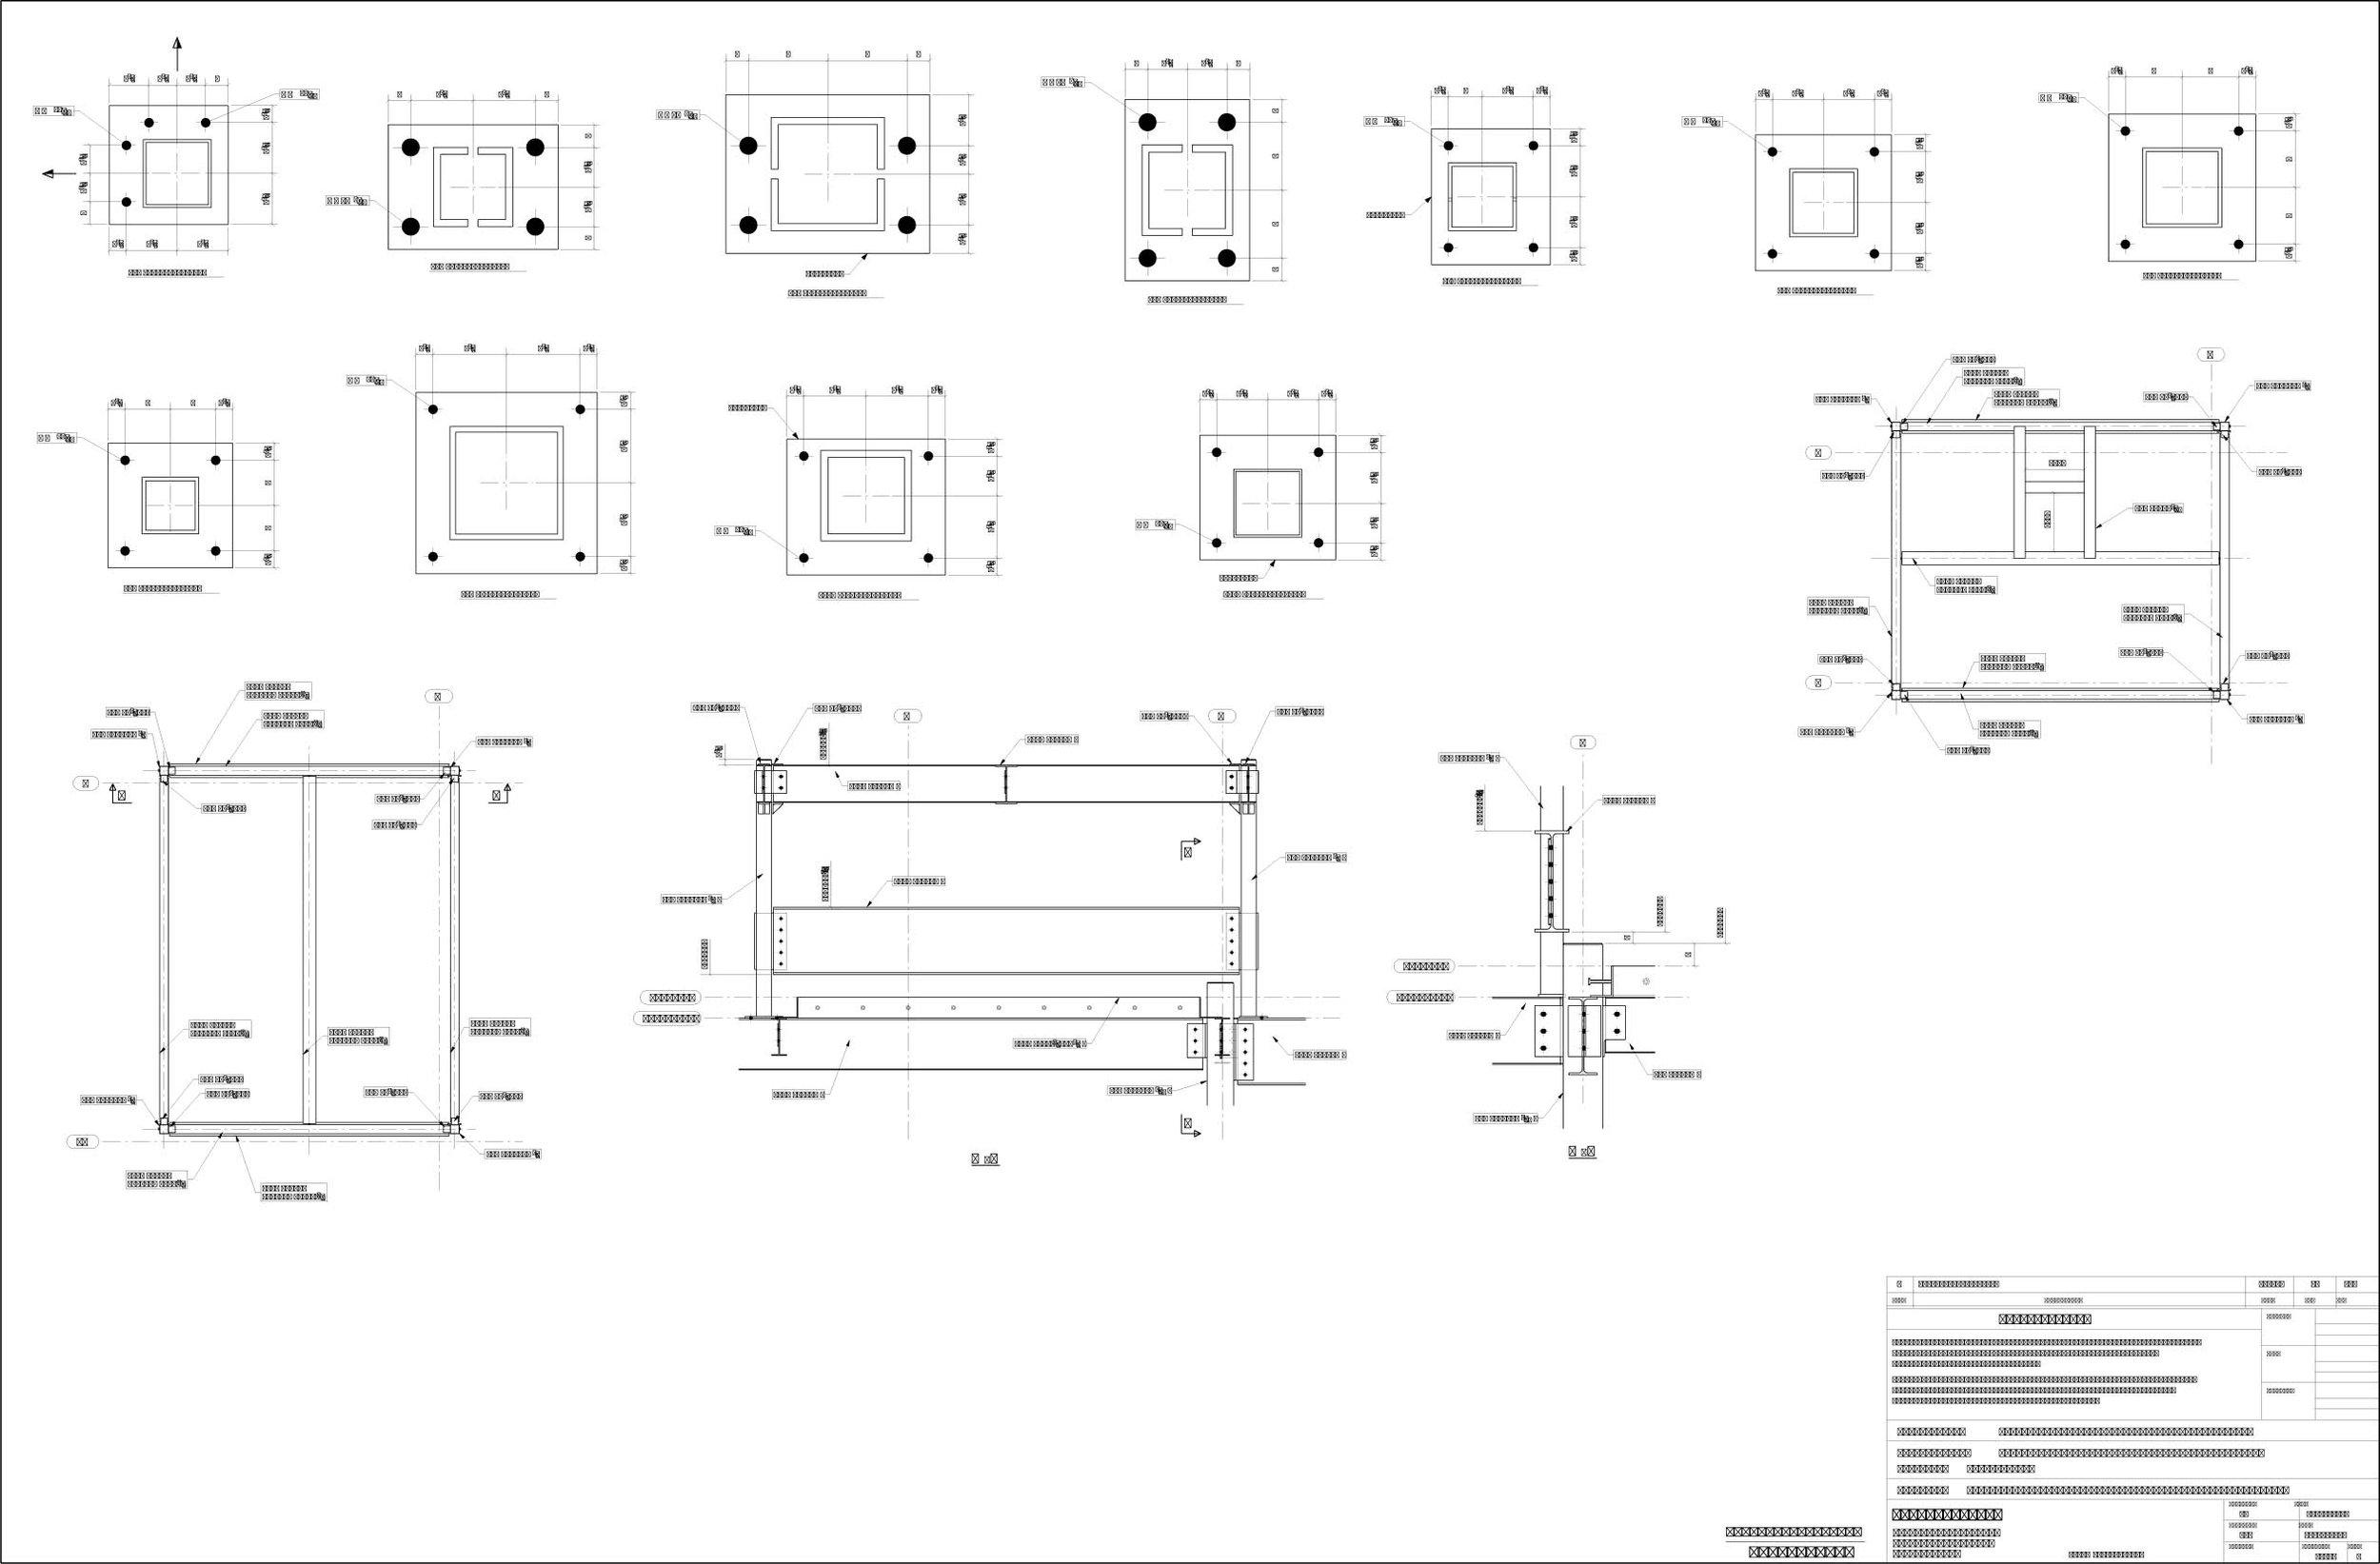 24x36-Placement-Plans-Rev-1-13.jpg